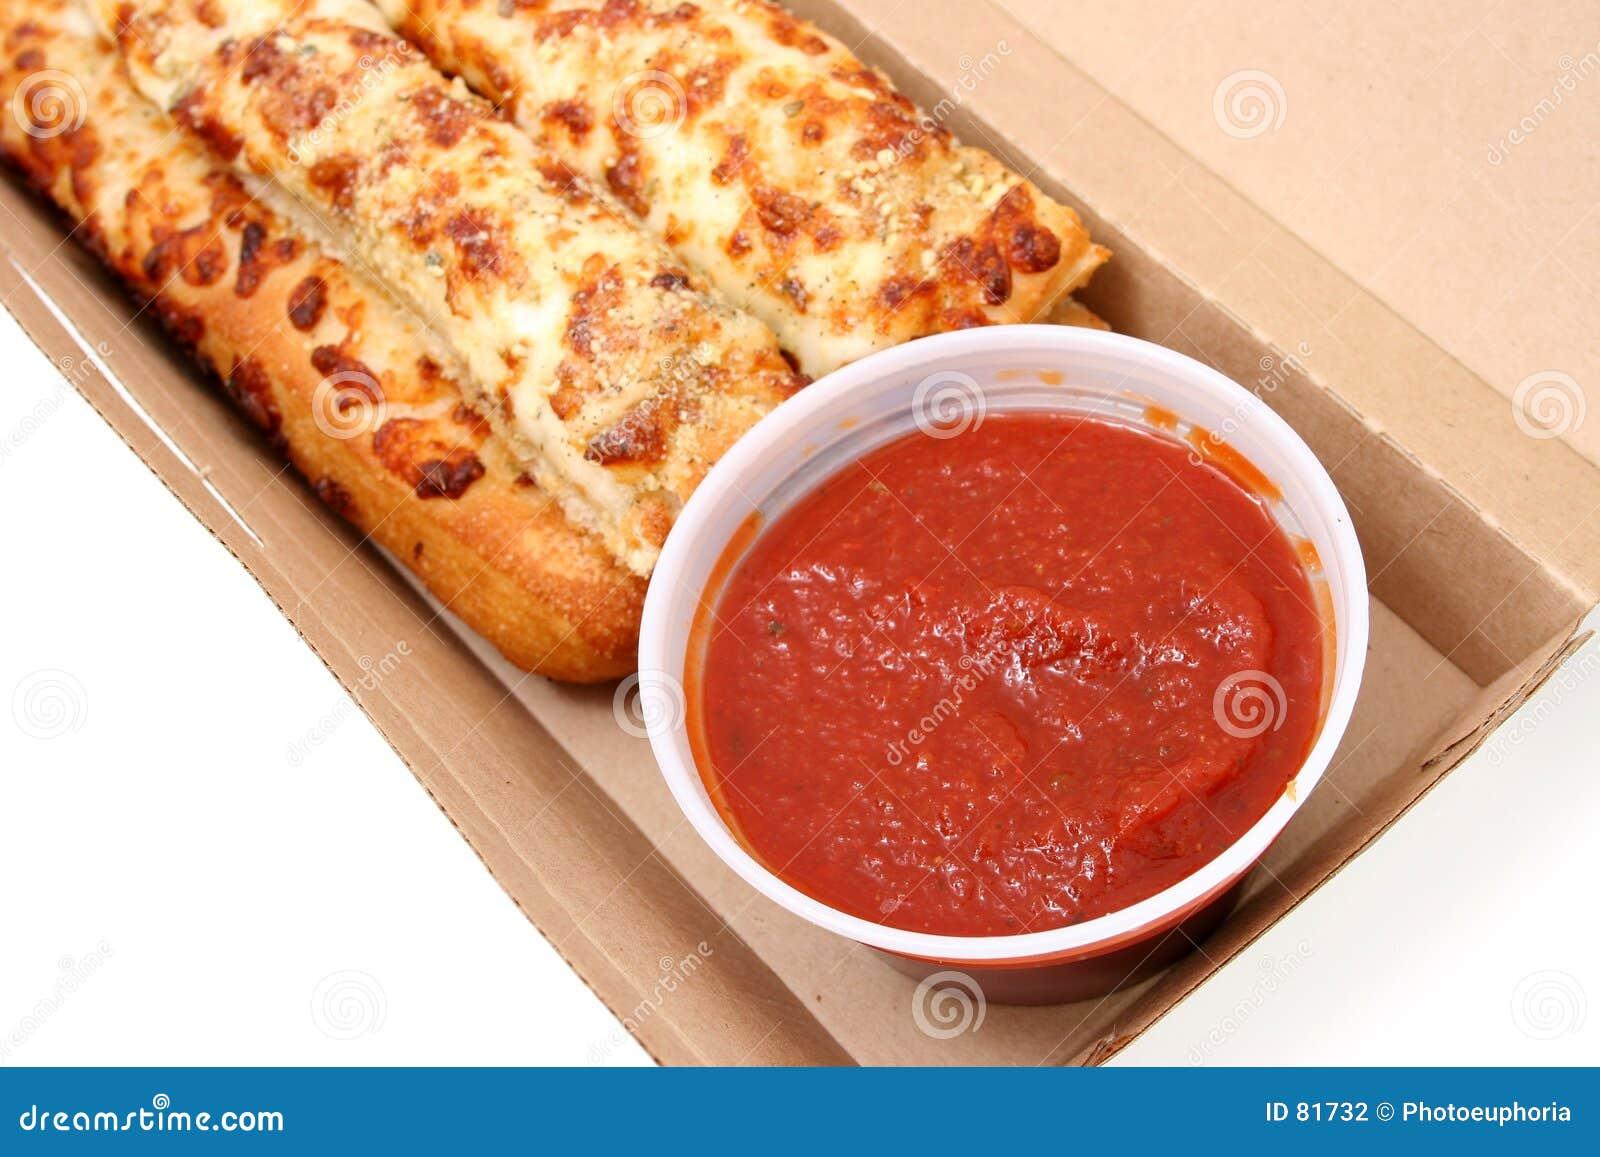 Cheese Bread And Marinara Sauce Stock Photo Image Of